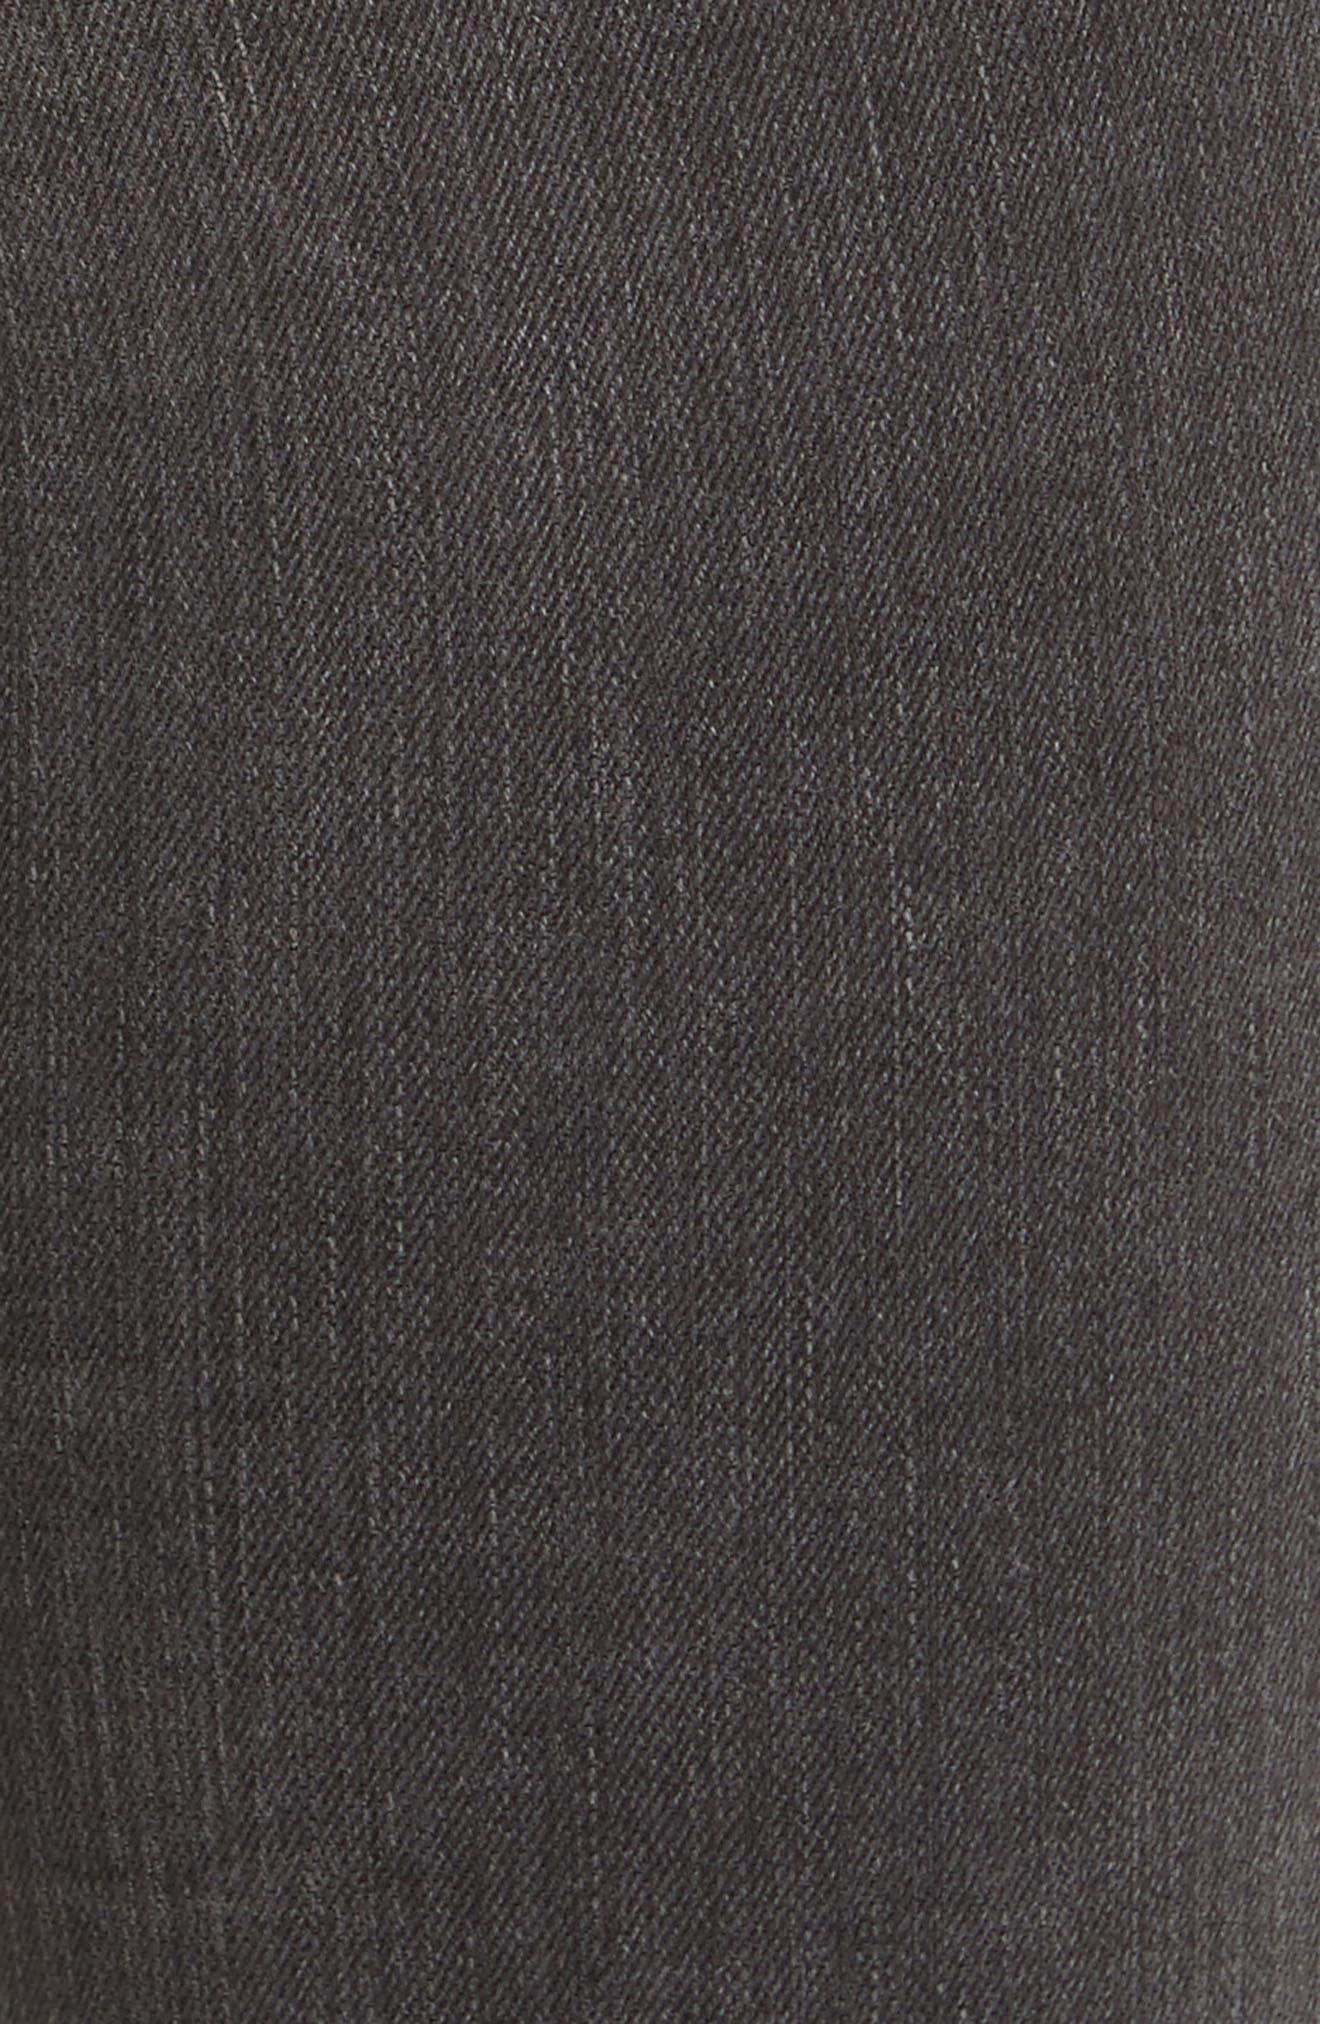 Crop Straight Leg Jeans,                             Alternate thumbnail 5, color,                             Black